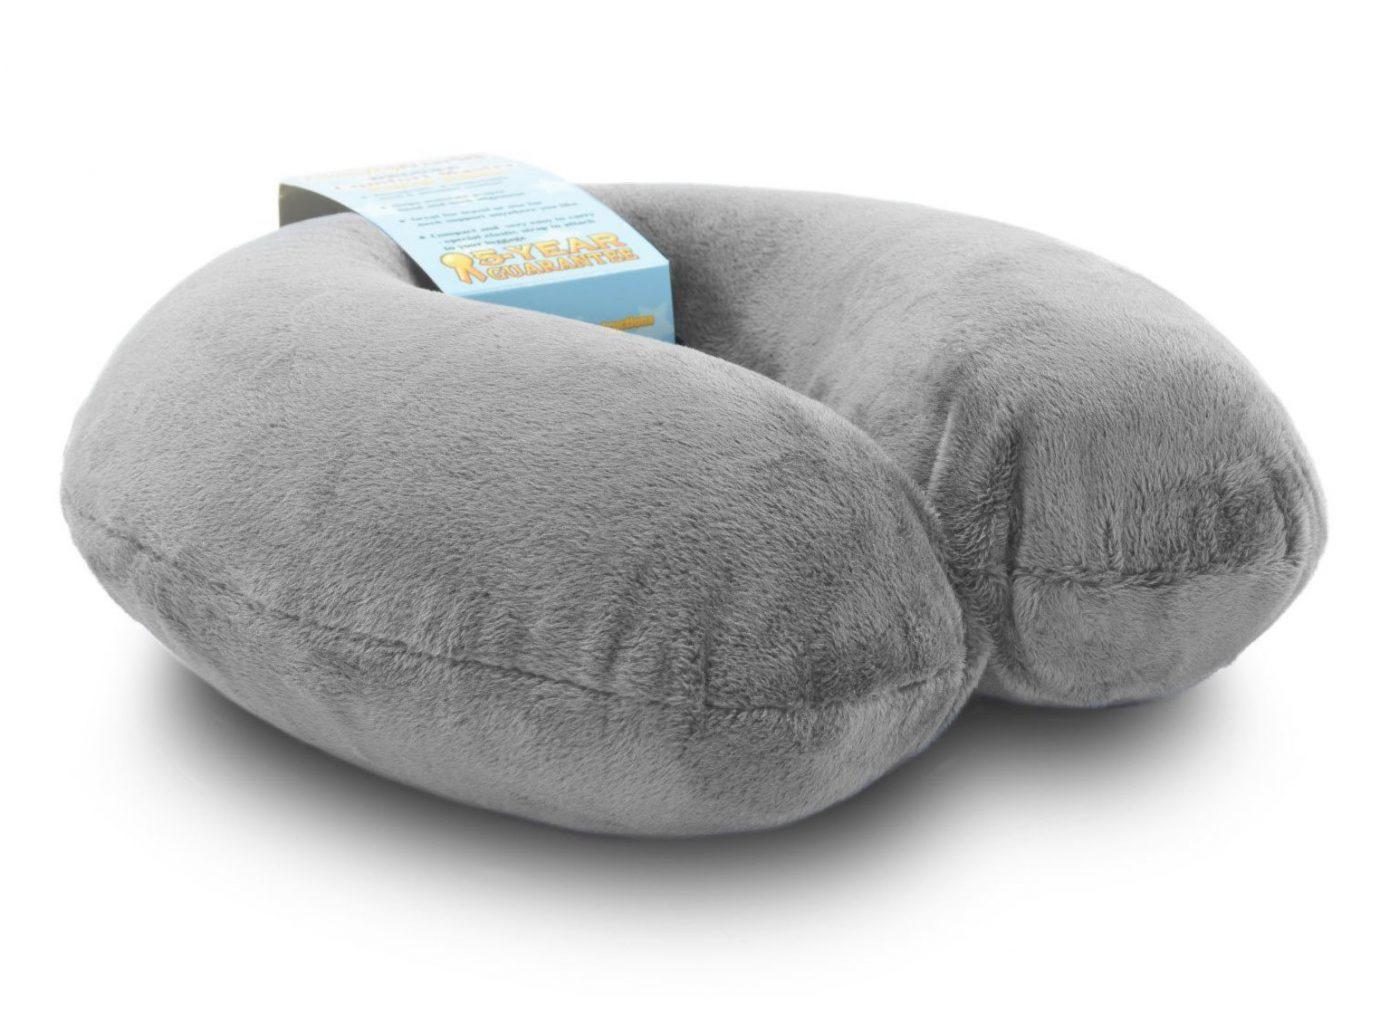 Grey Craft World Comfortable Travel Pillow